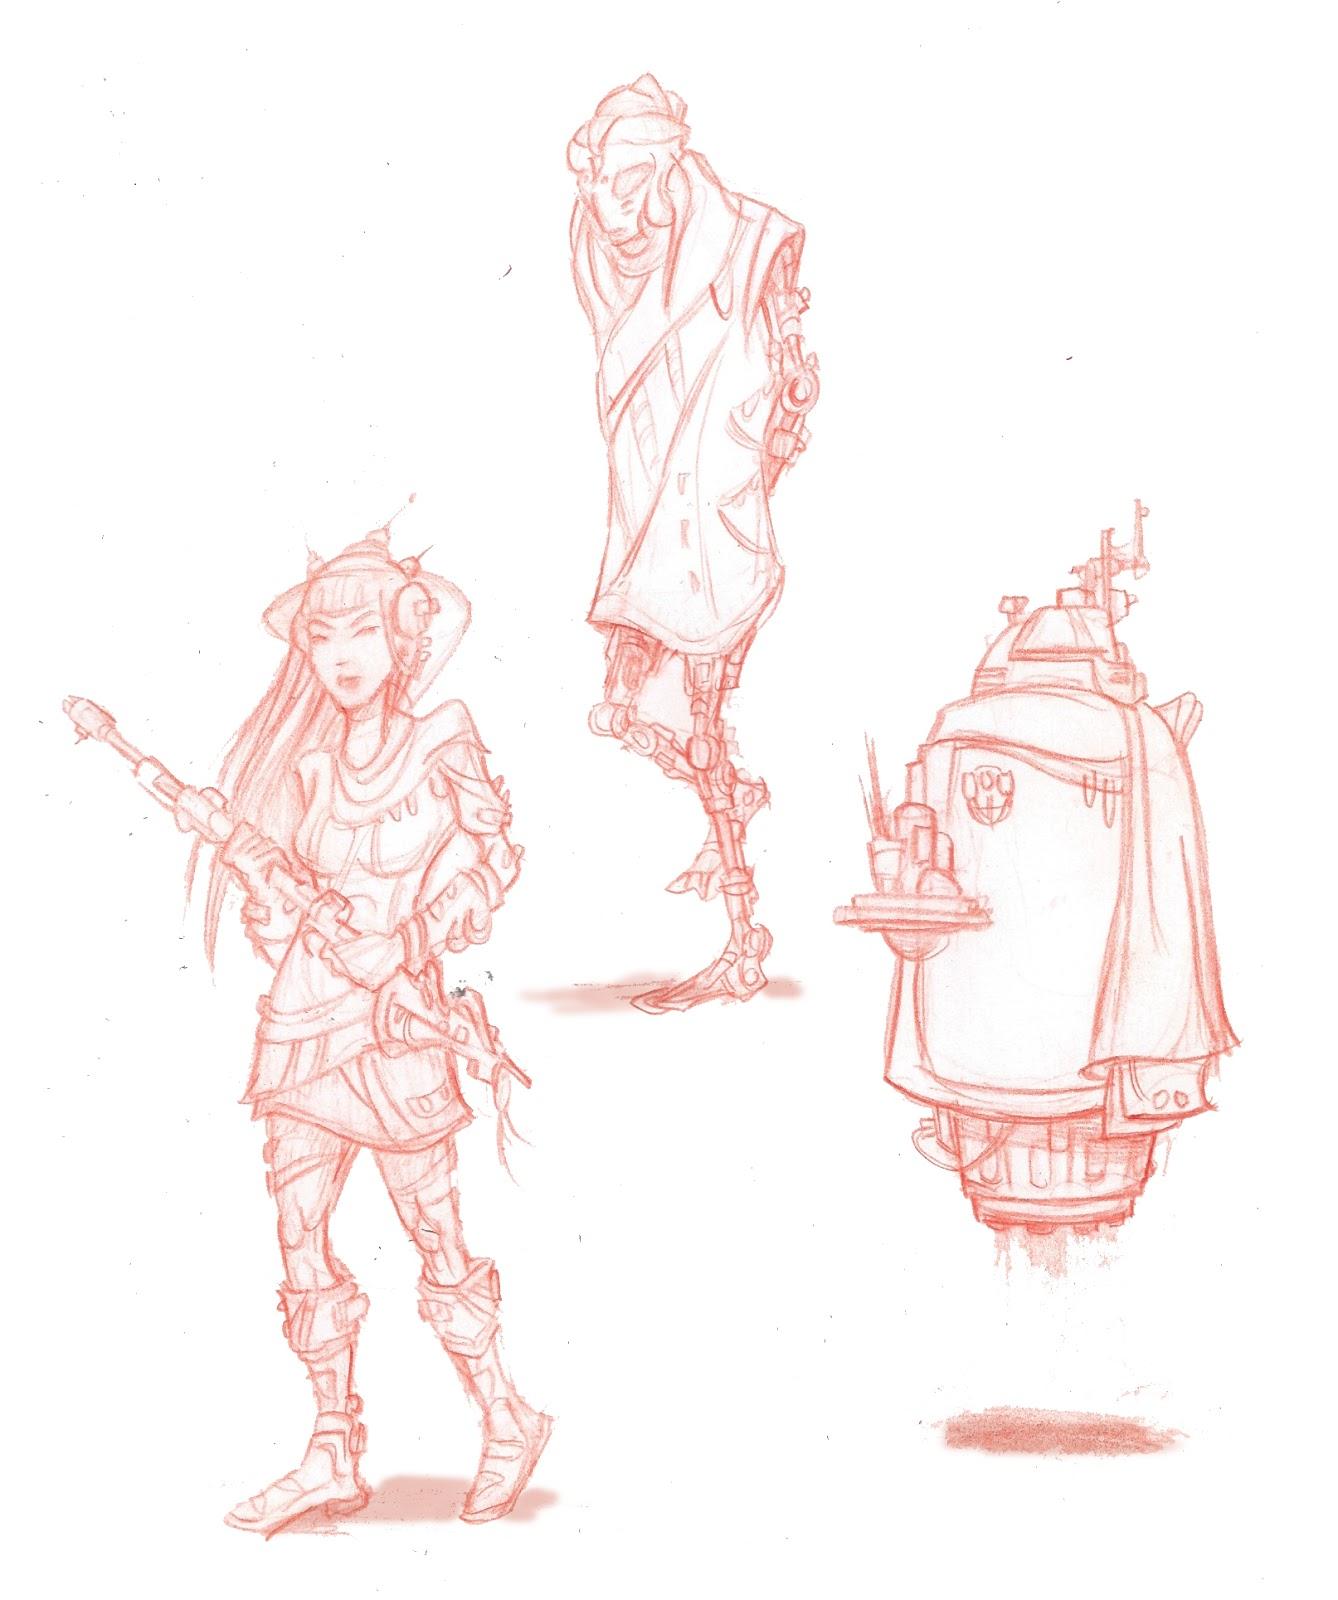 Character Design Sketchbook : Sketchbook character design